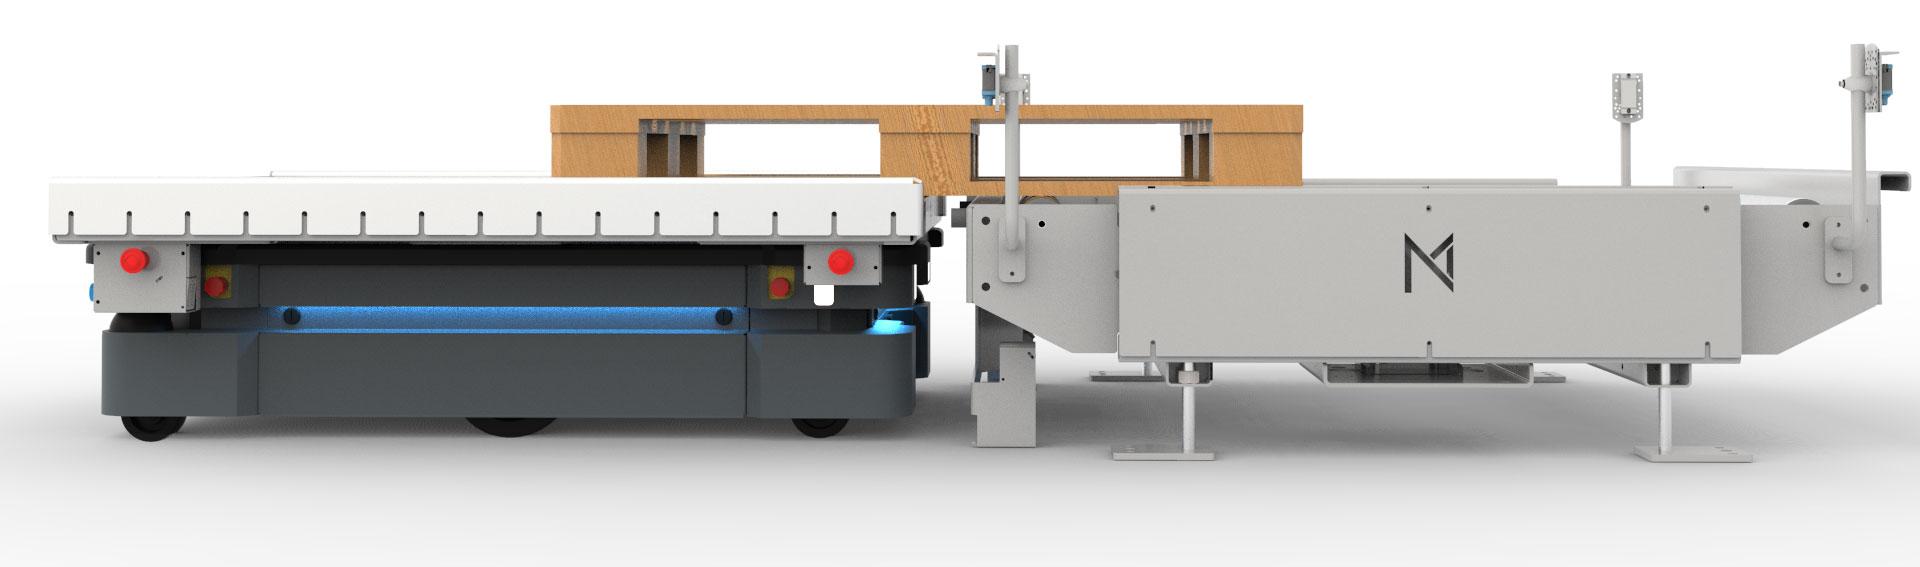 Nord Modules Pallet Mover mit MiR